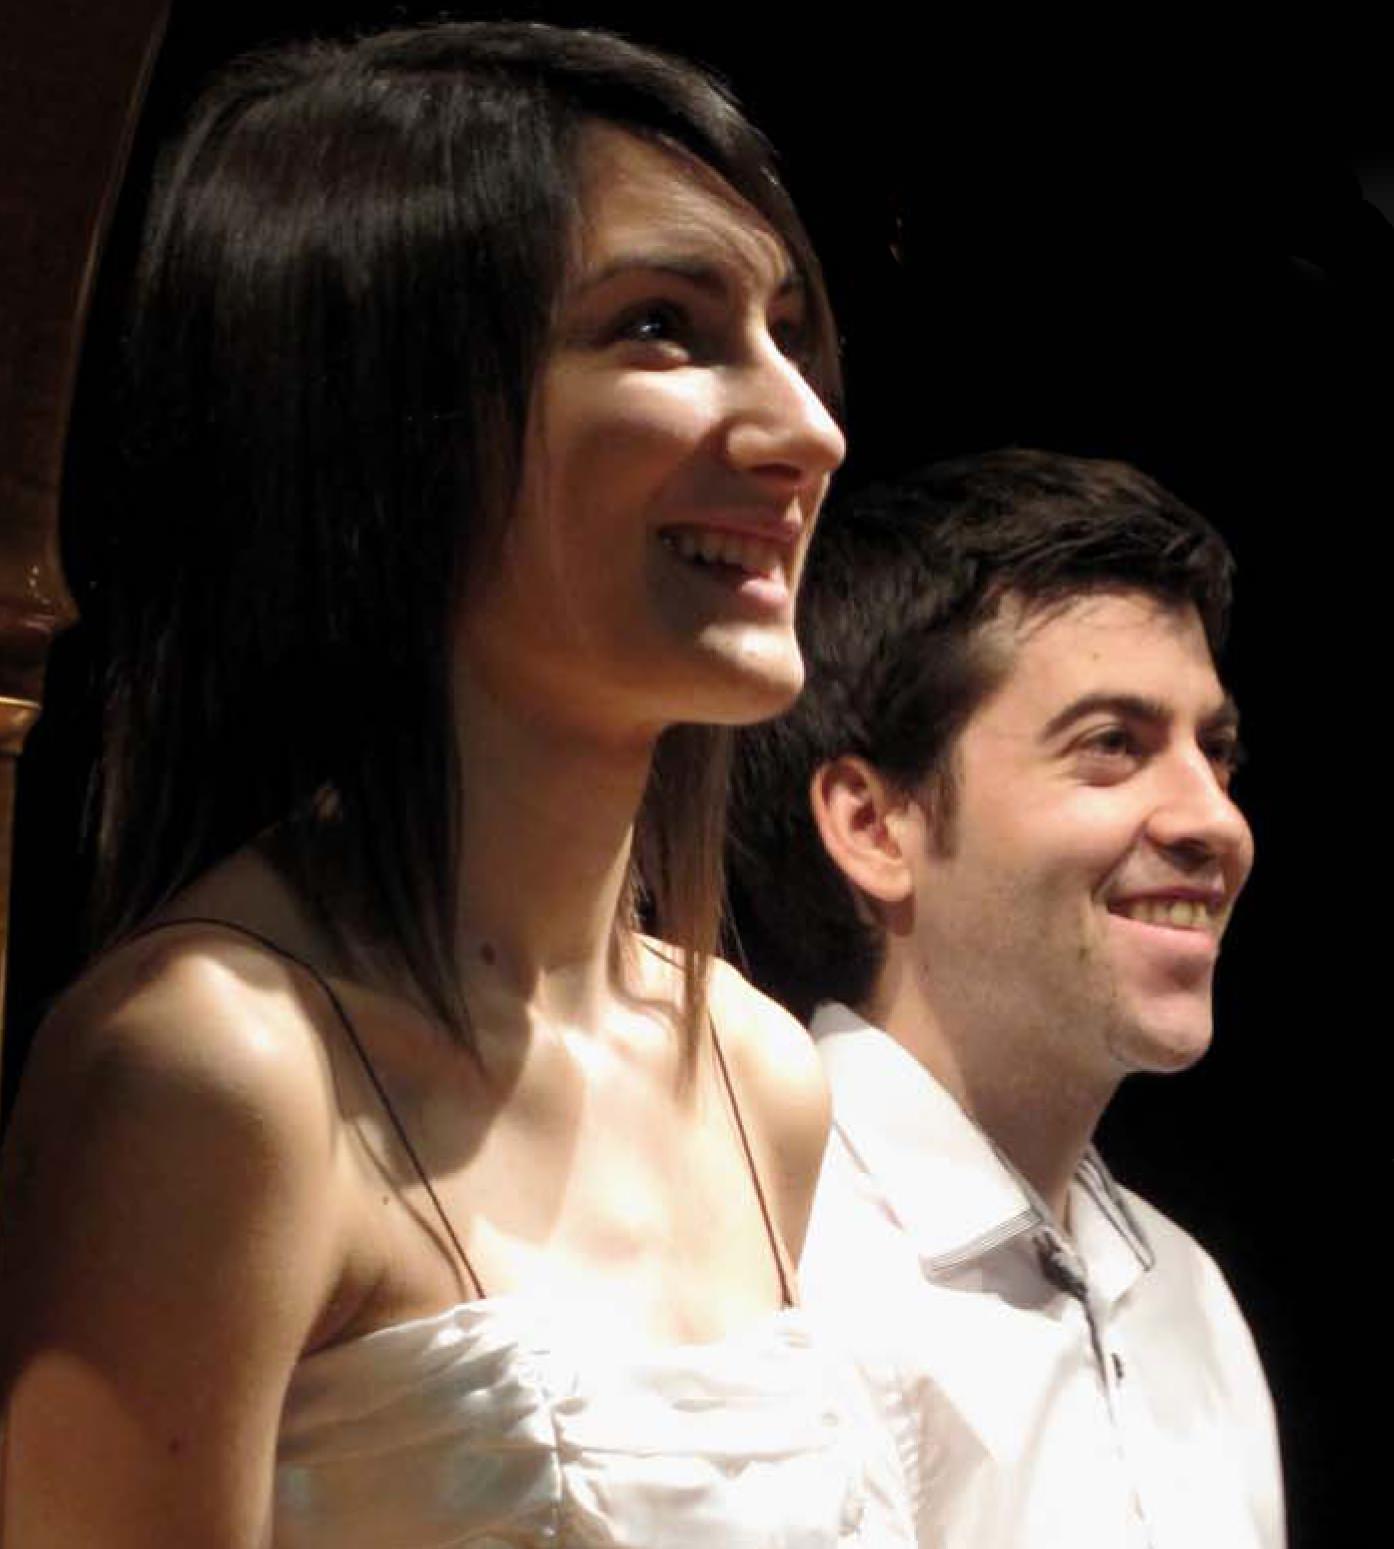 Esther Pinyol y Ferran Carceller